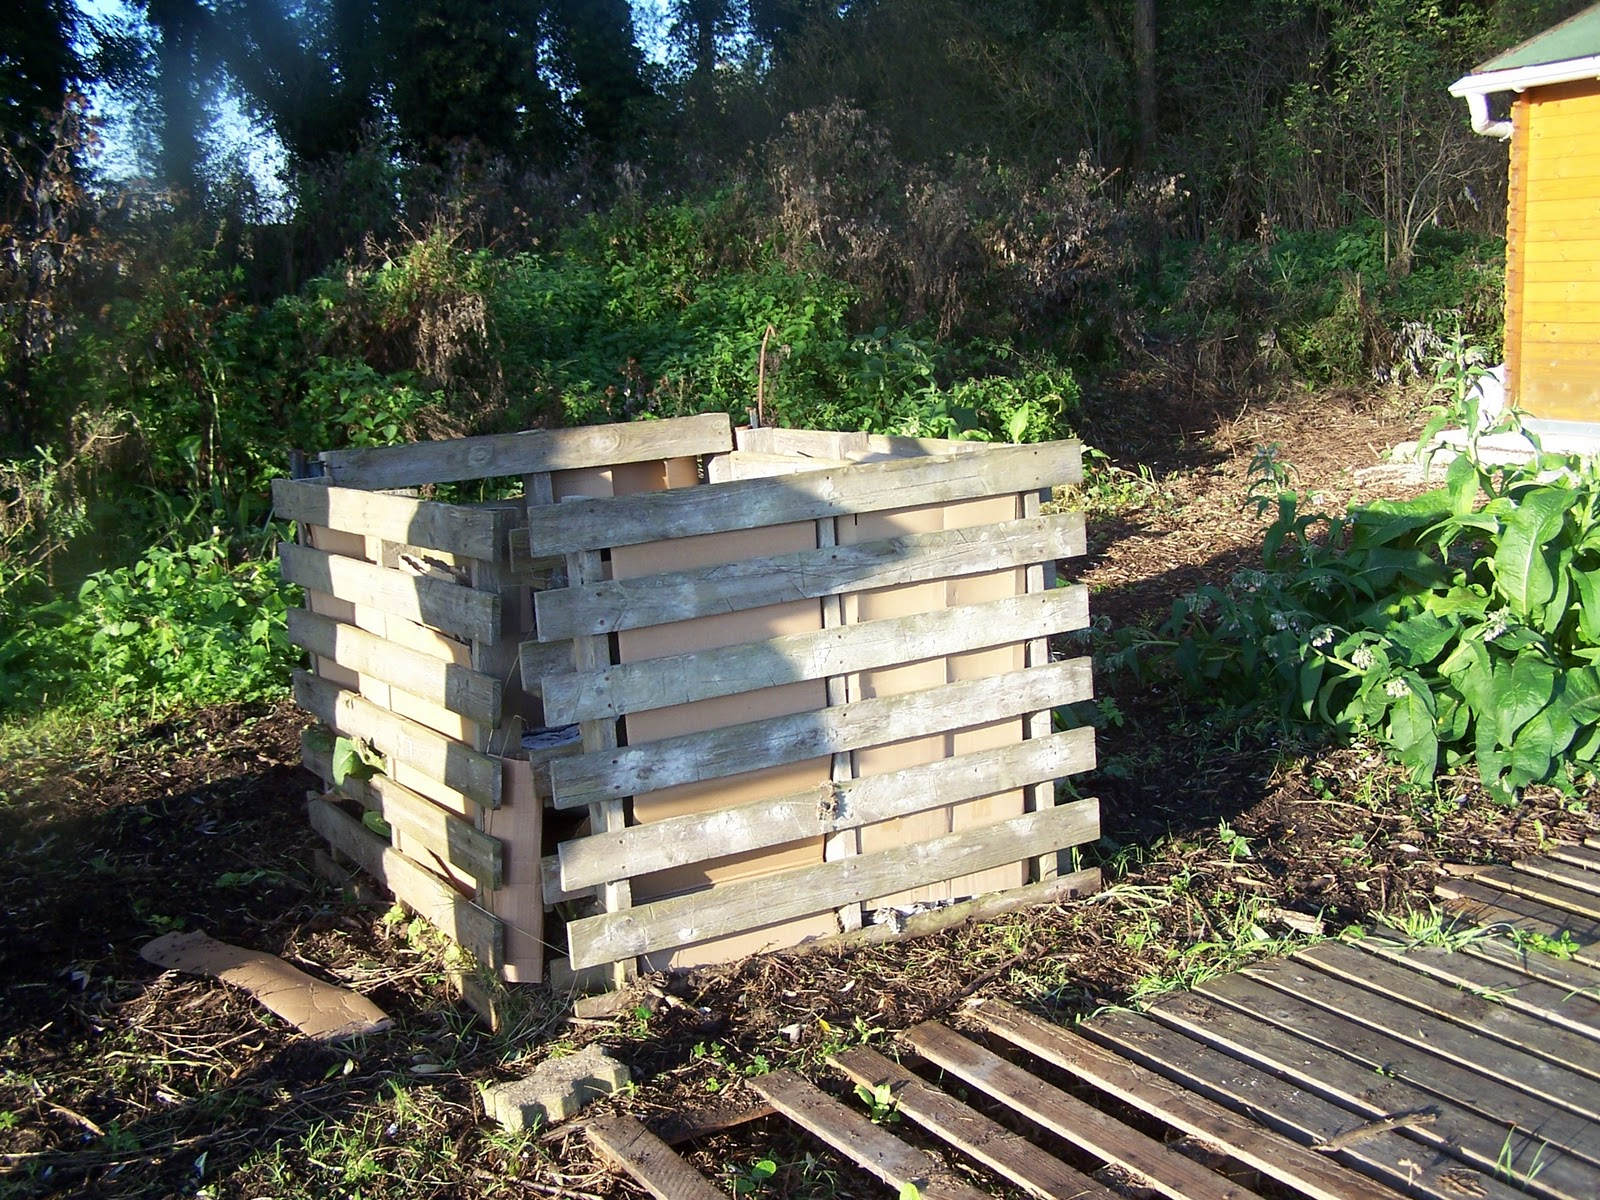 ecolo bio nature permaculture urbaine et jardinage bio composter a s 39 apprend. Black Bedroom Furniture Sets. Home Design Ideas